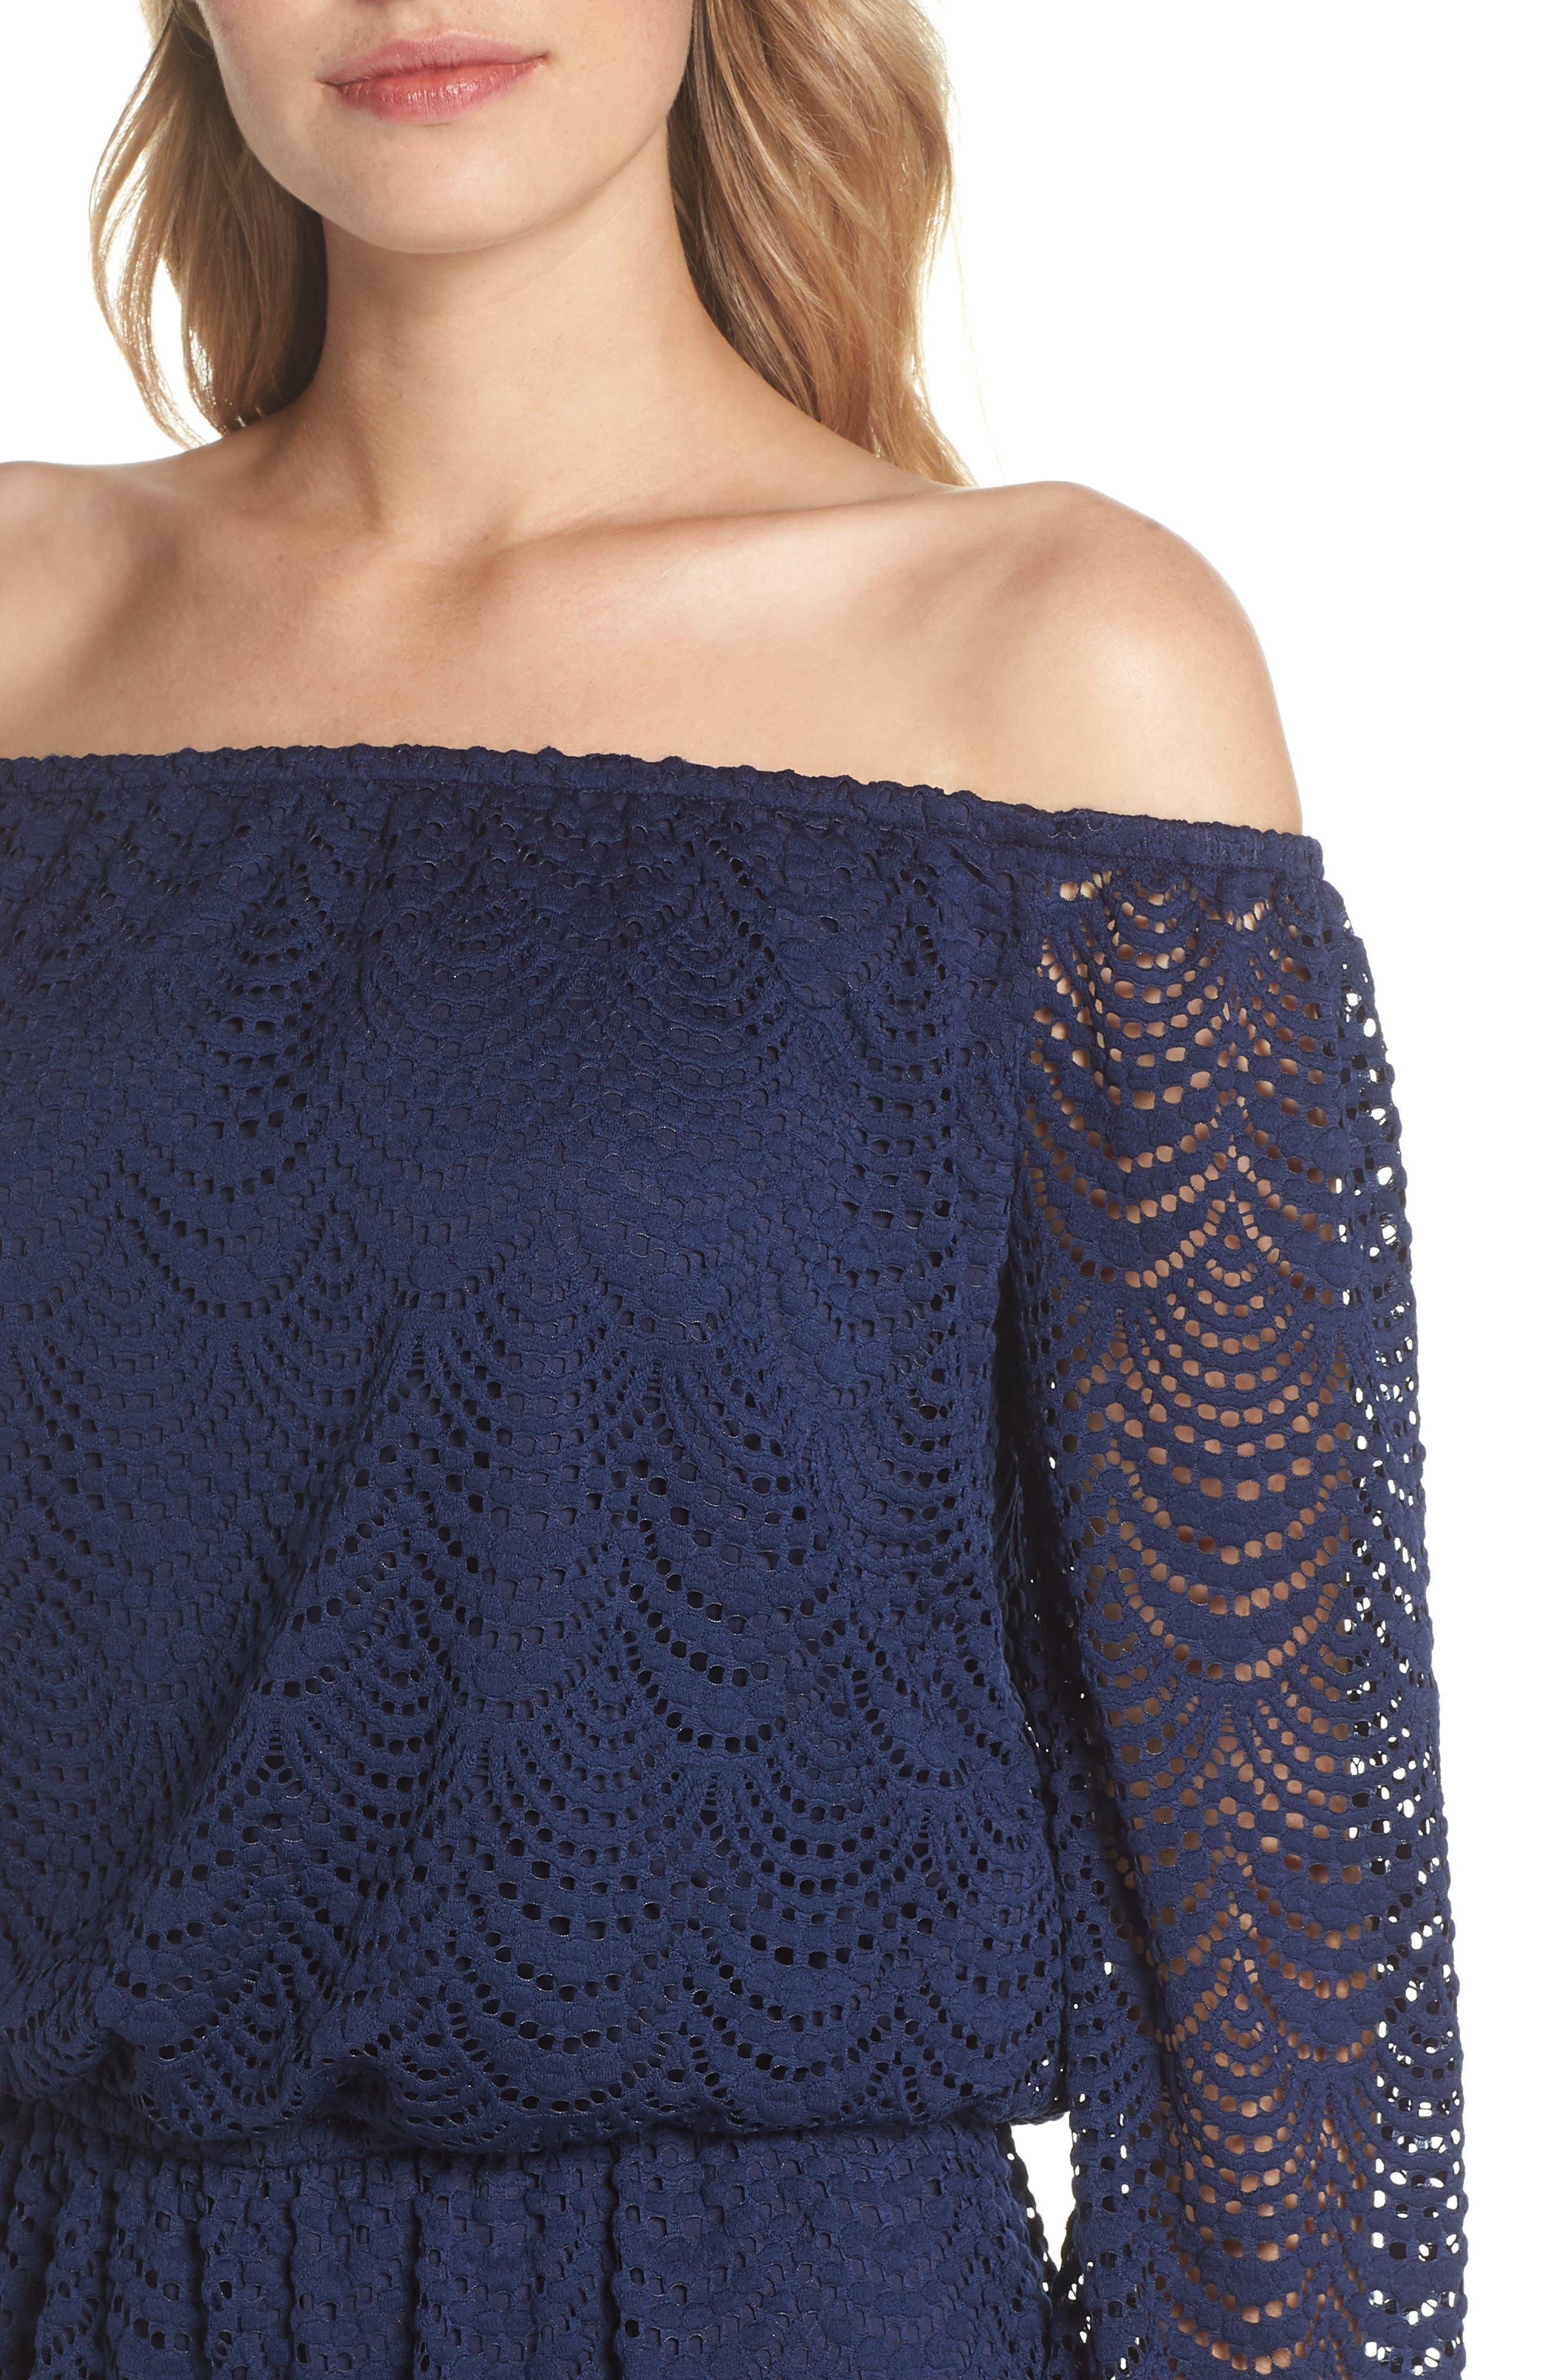 Lana Off the Shoulder Dress,                             Alternate thumbnail 4, color,                             408